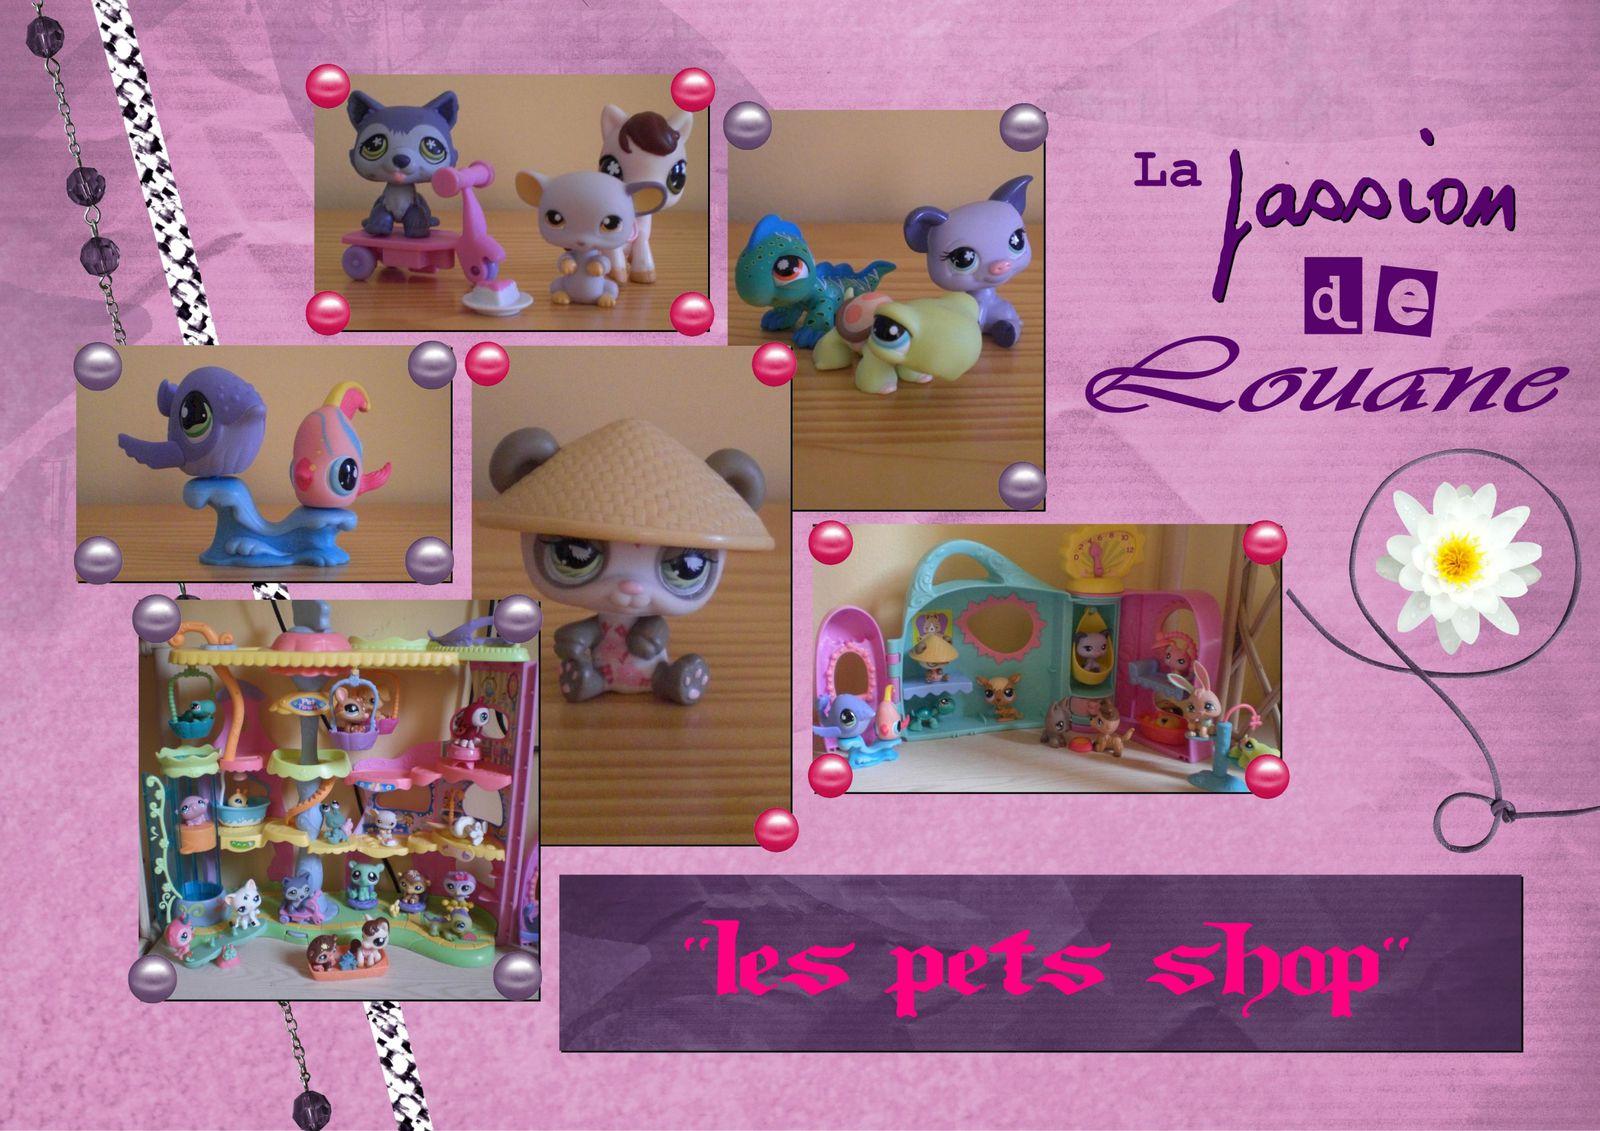 14---La-passion-de-Louane.jpg